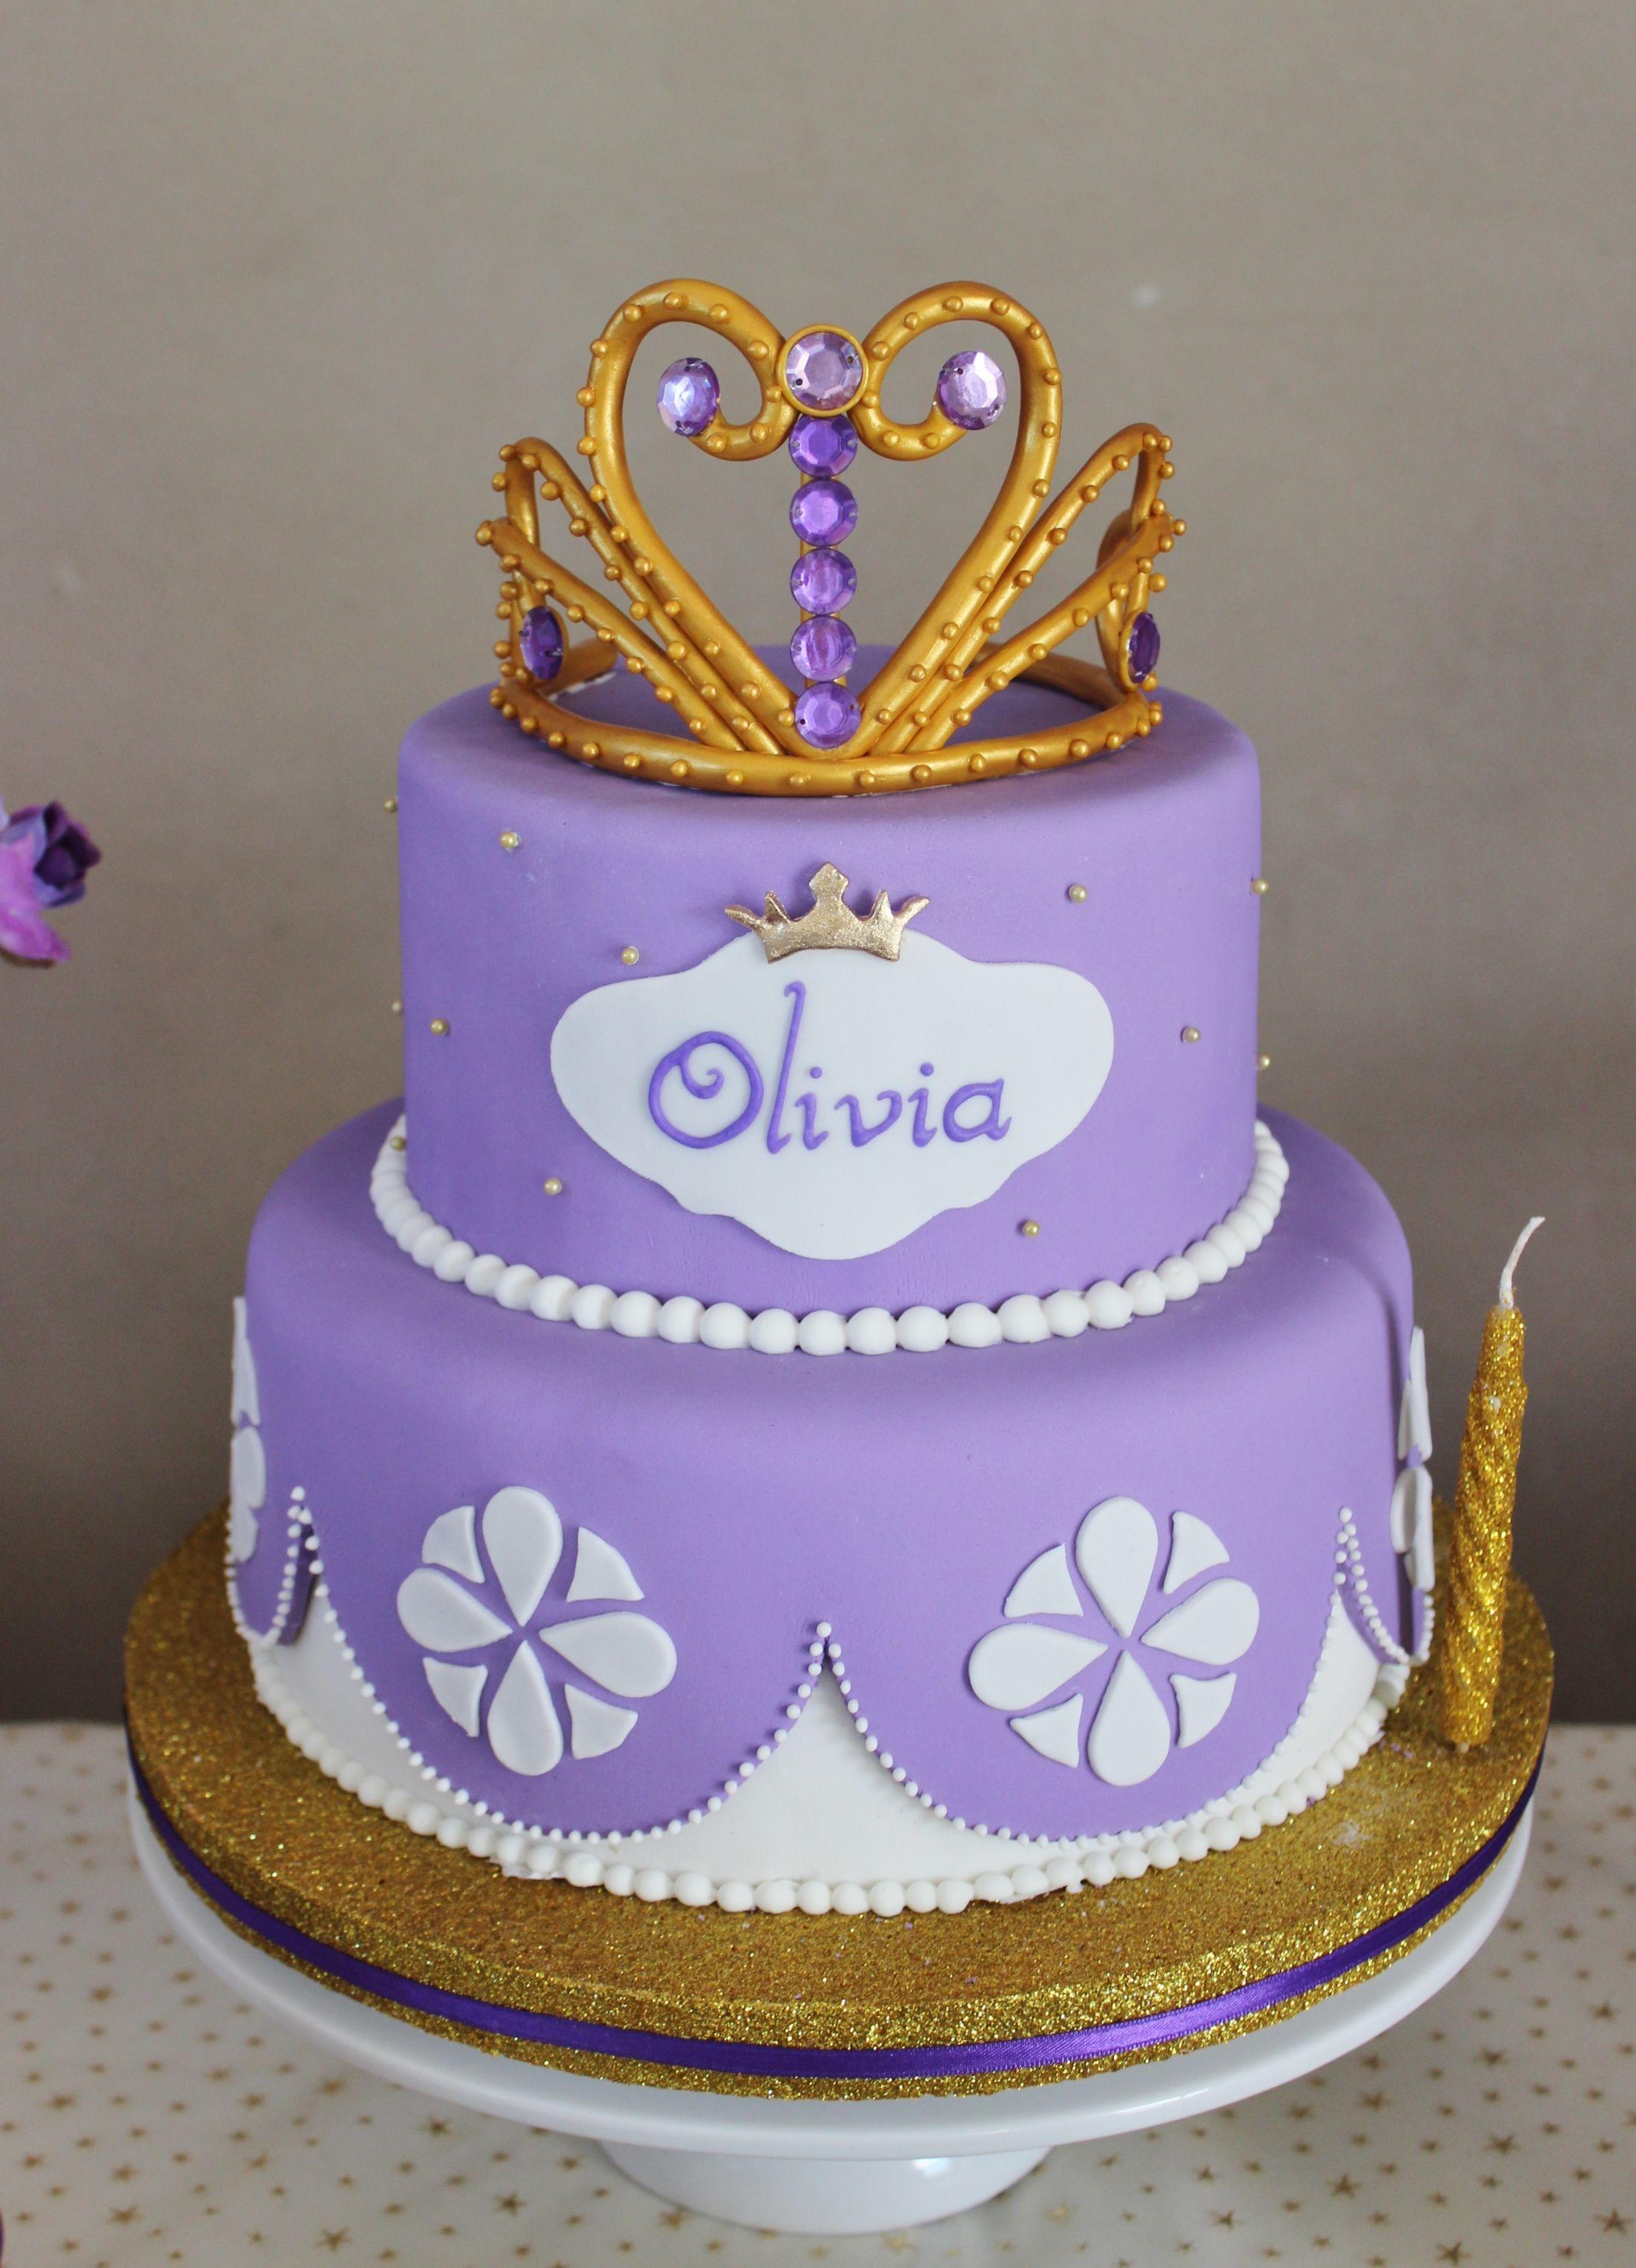 Sofia the First Birthday Party Ideas | Pinterest | Princesa sofía ...